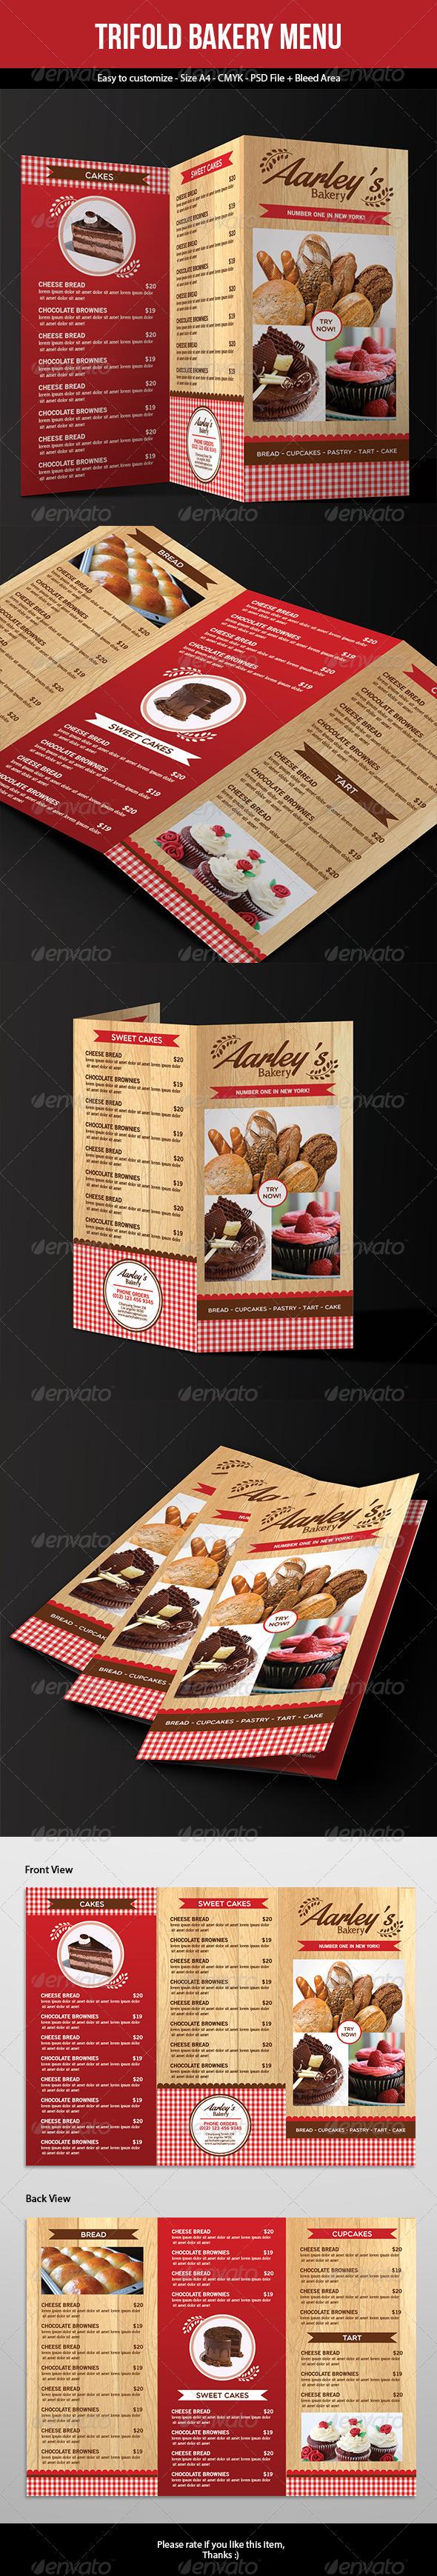 Trifold Bakery Menu - Food Menus Print Templates